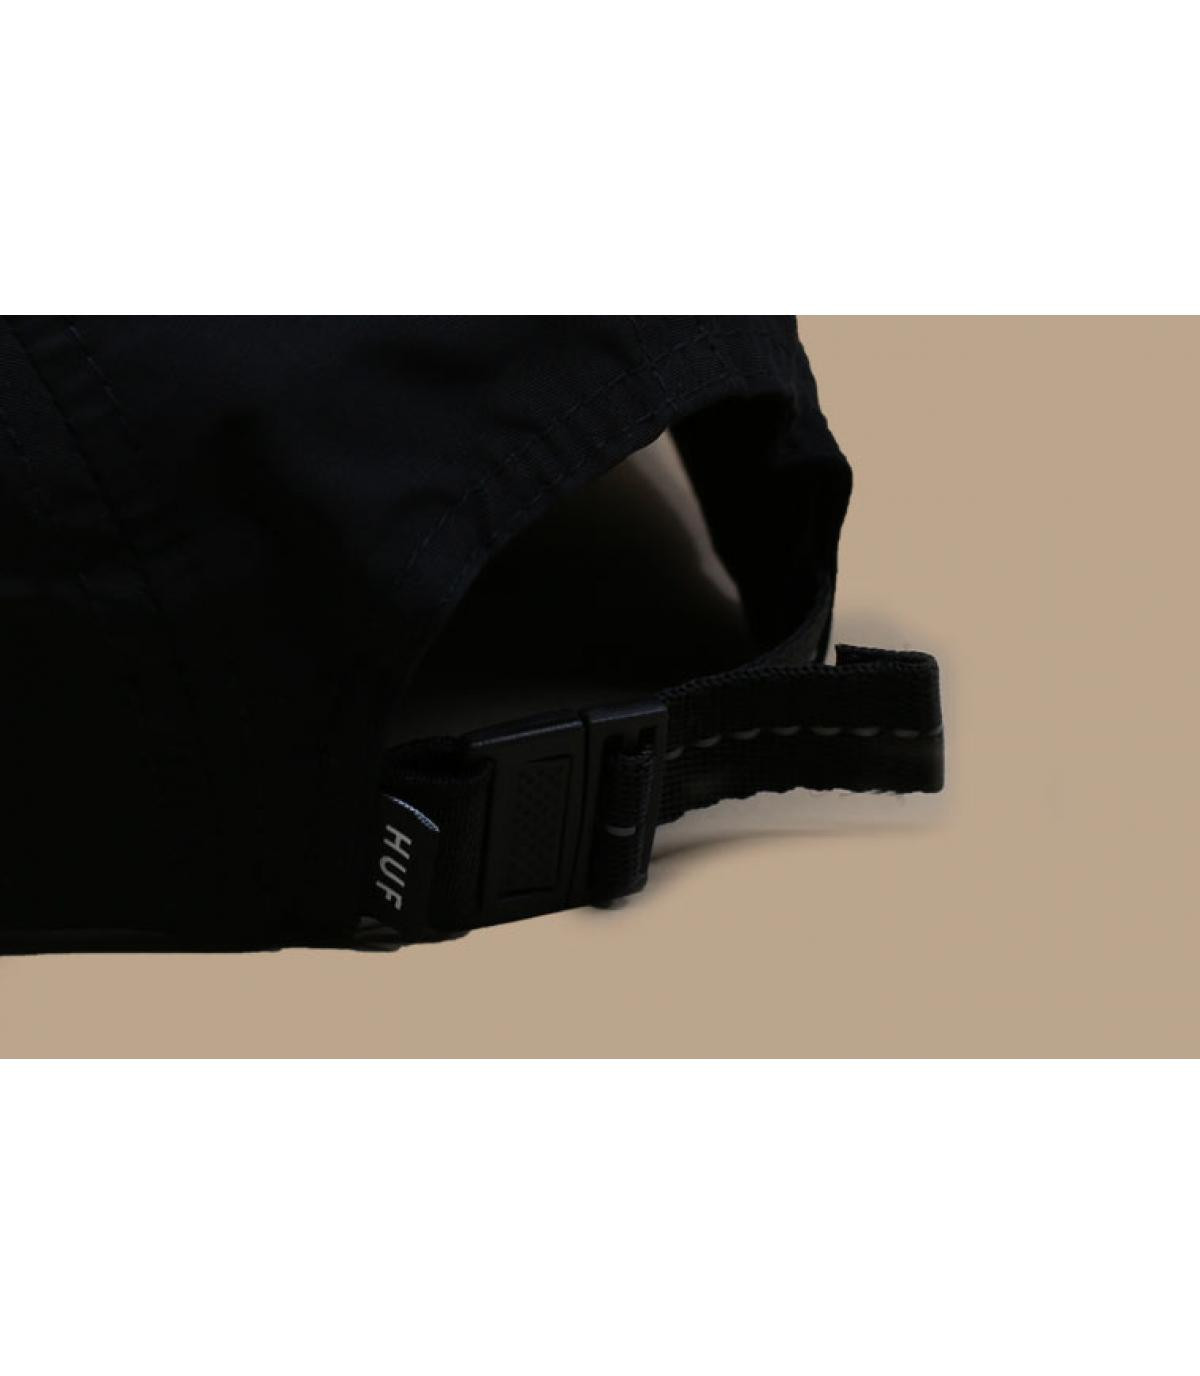 Détails Nylon Stash pocket 5Panel black - image 5